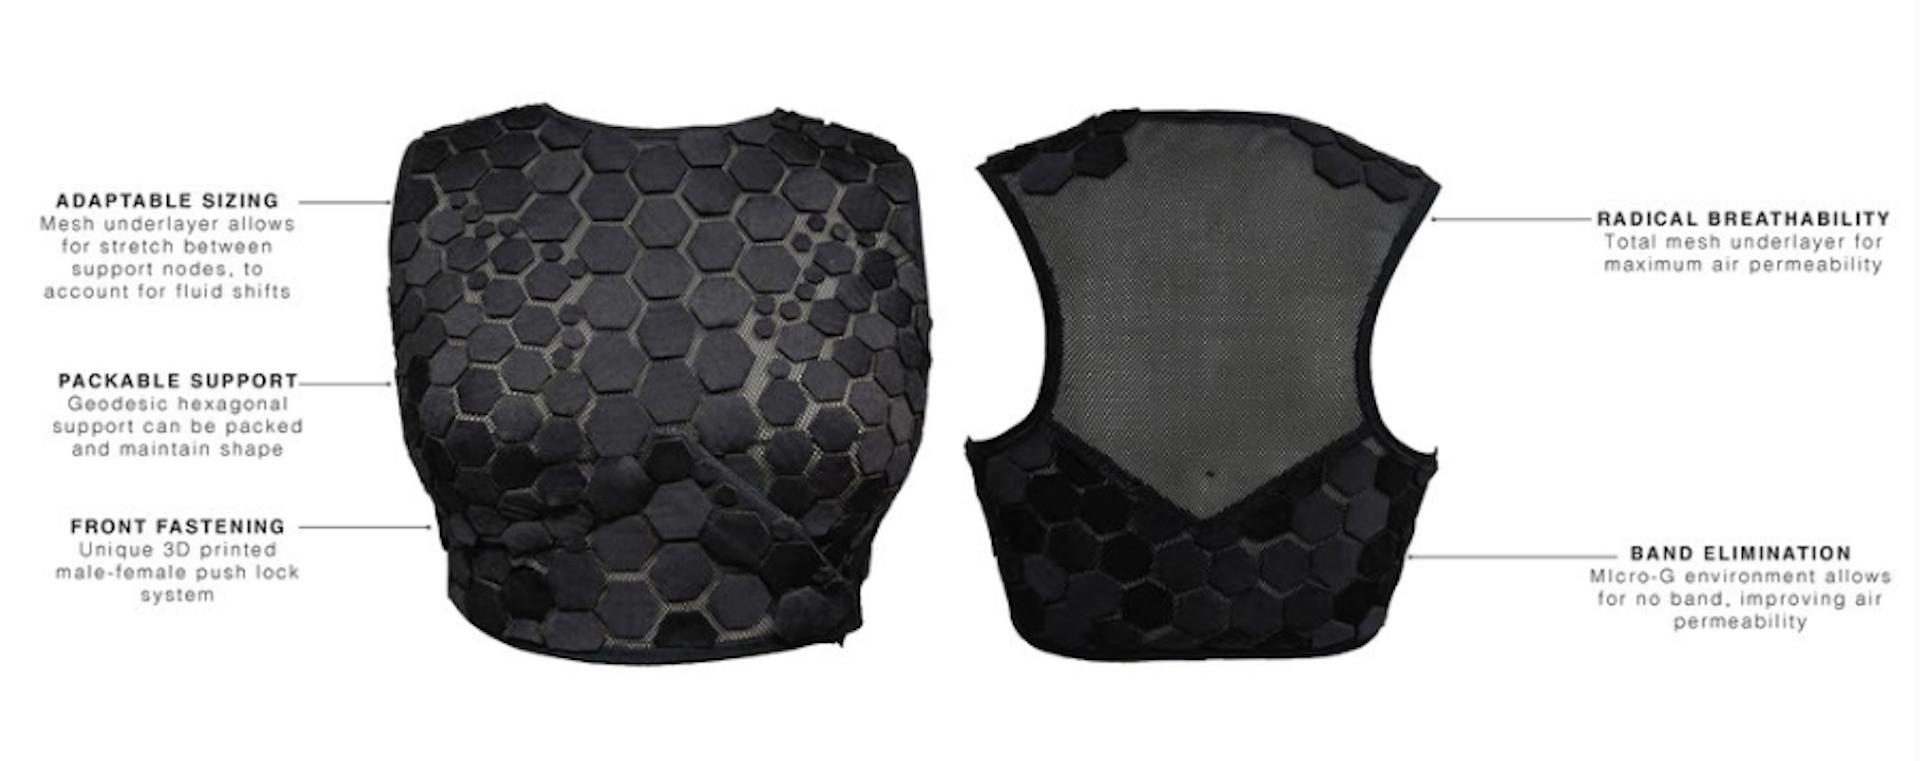 Olivia Echols' final design of the space bra. Photo credit: Olivia Echols